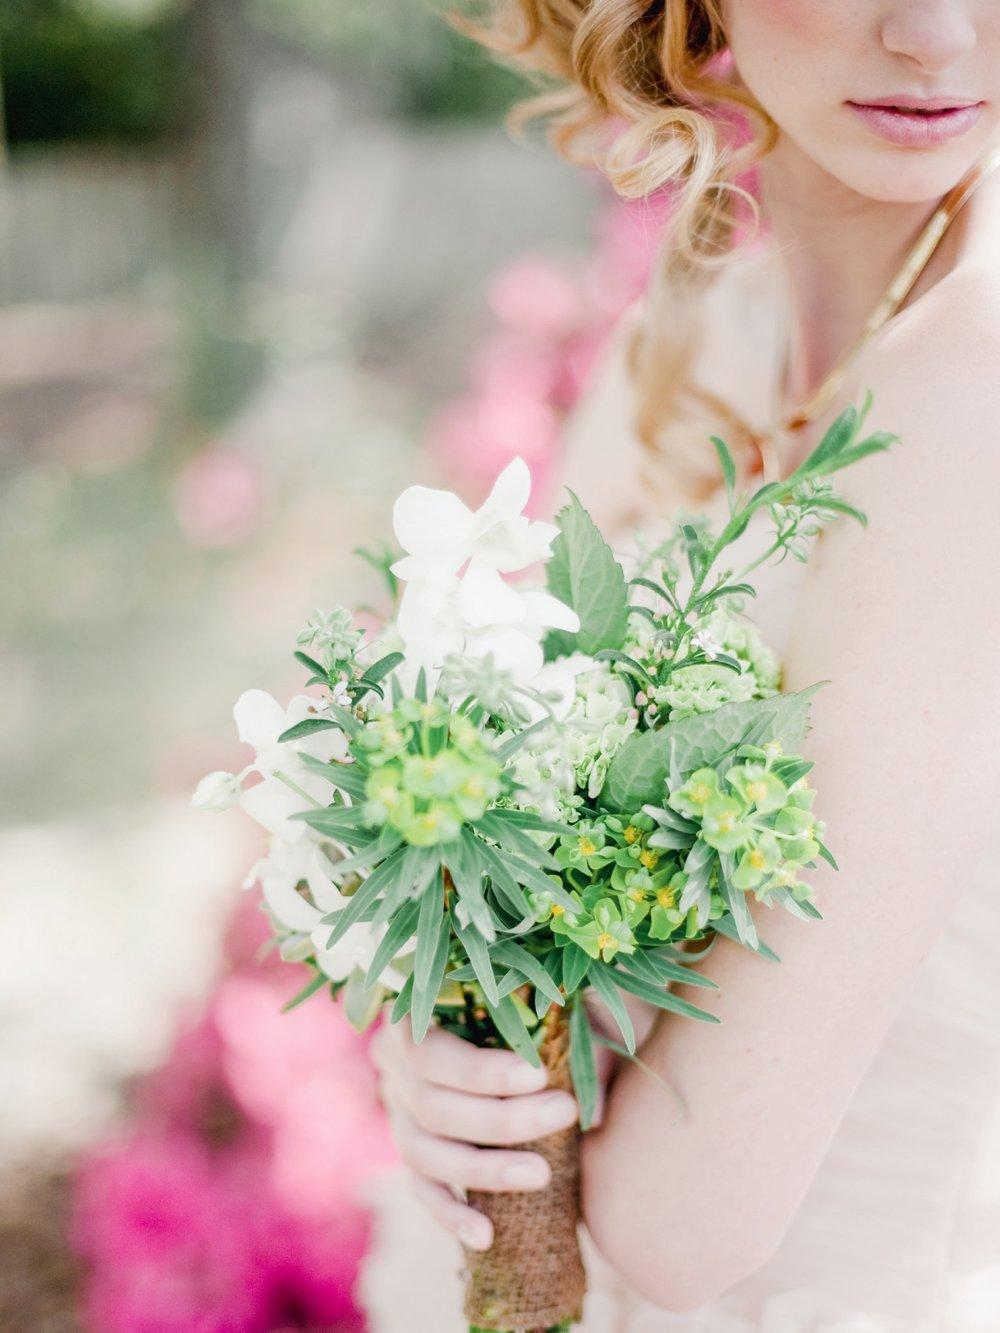 west palm beach wedding photographer west palm beach boudoir shannon griffin photography_0024.jpg